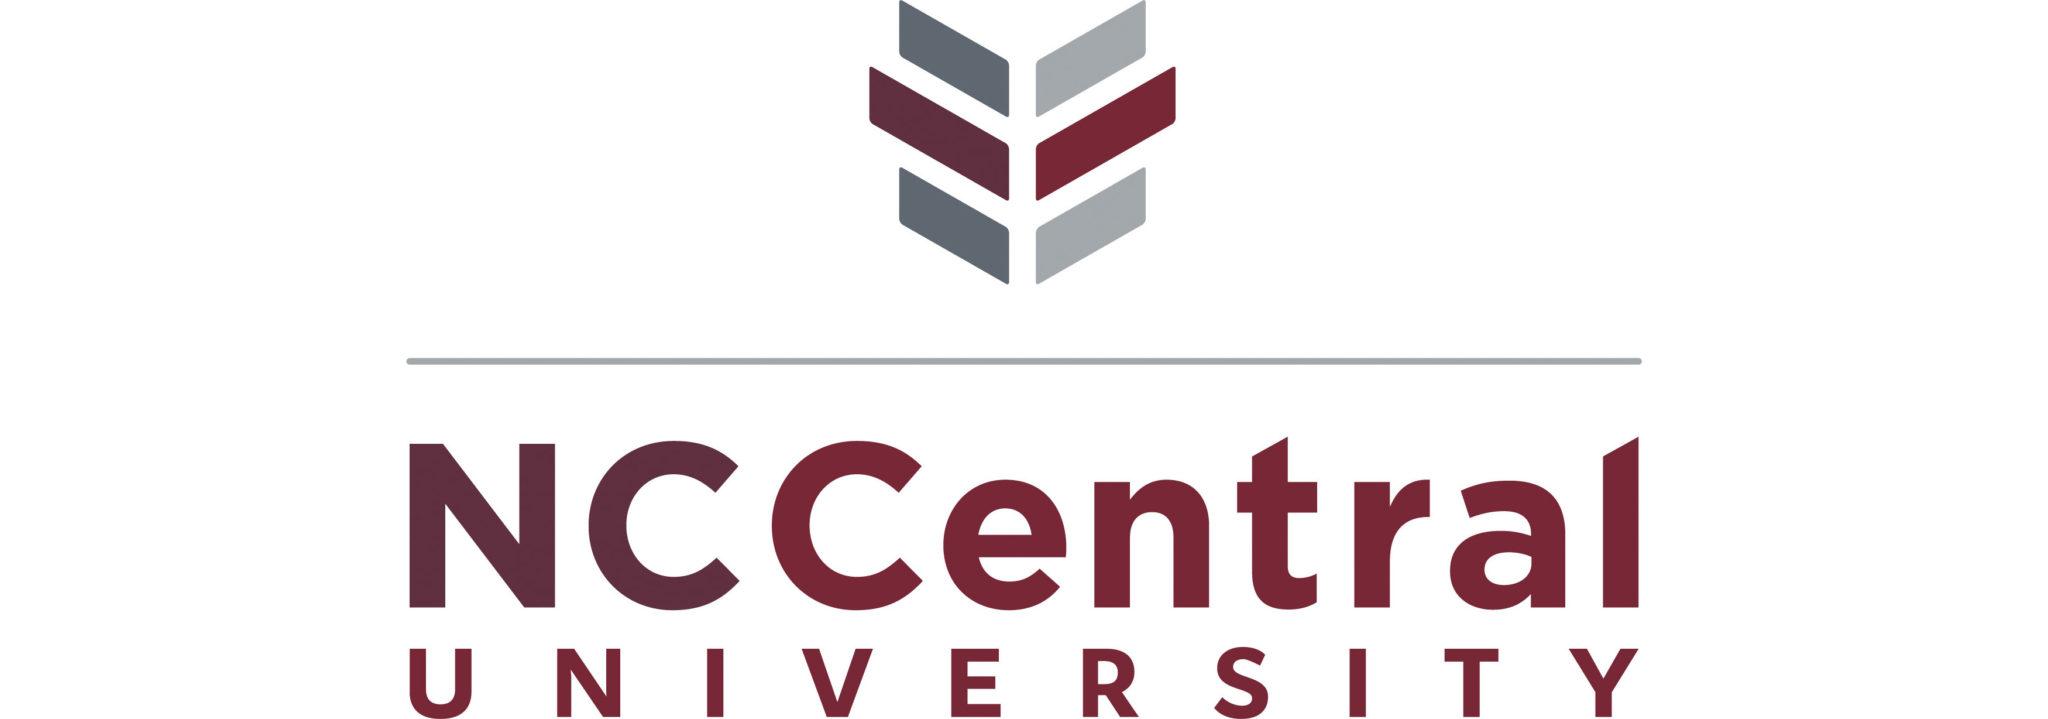 NCCU vert color logo